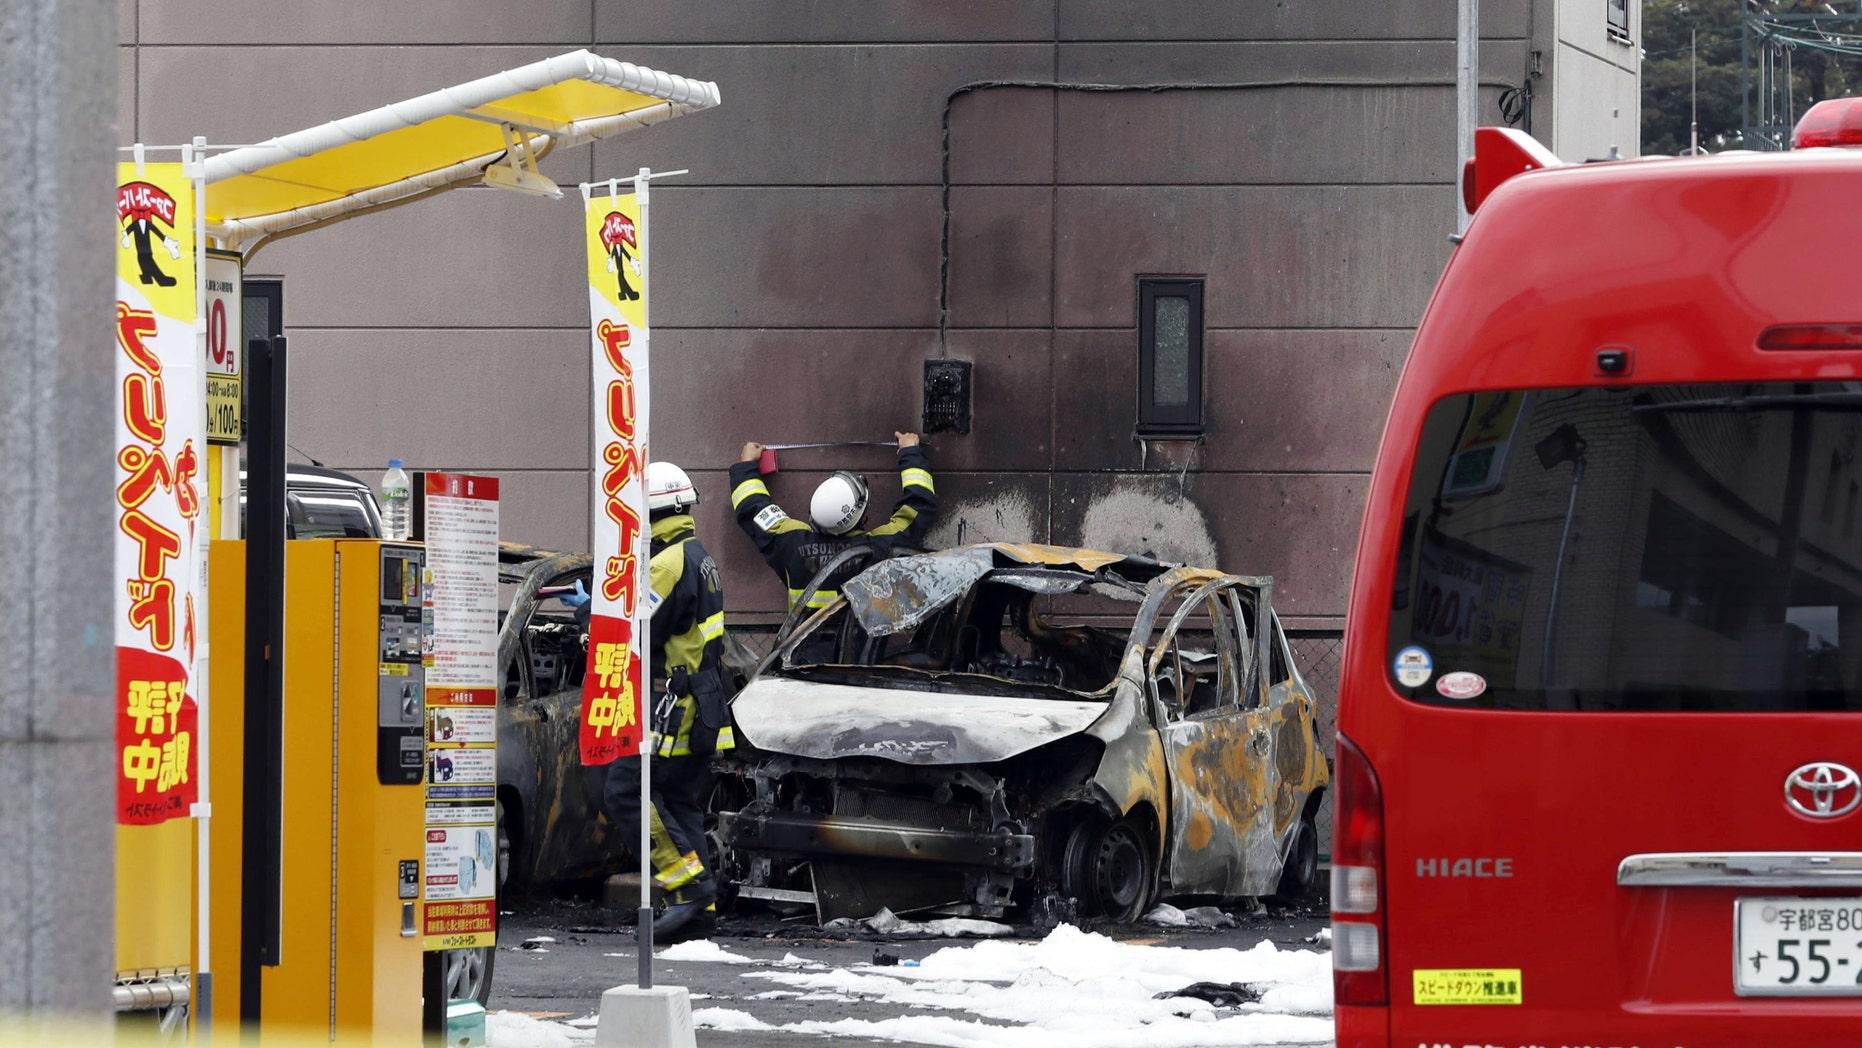 Firefighters investigating the scene in Utsunomiya, north of Tokyo.